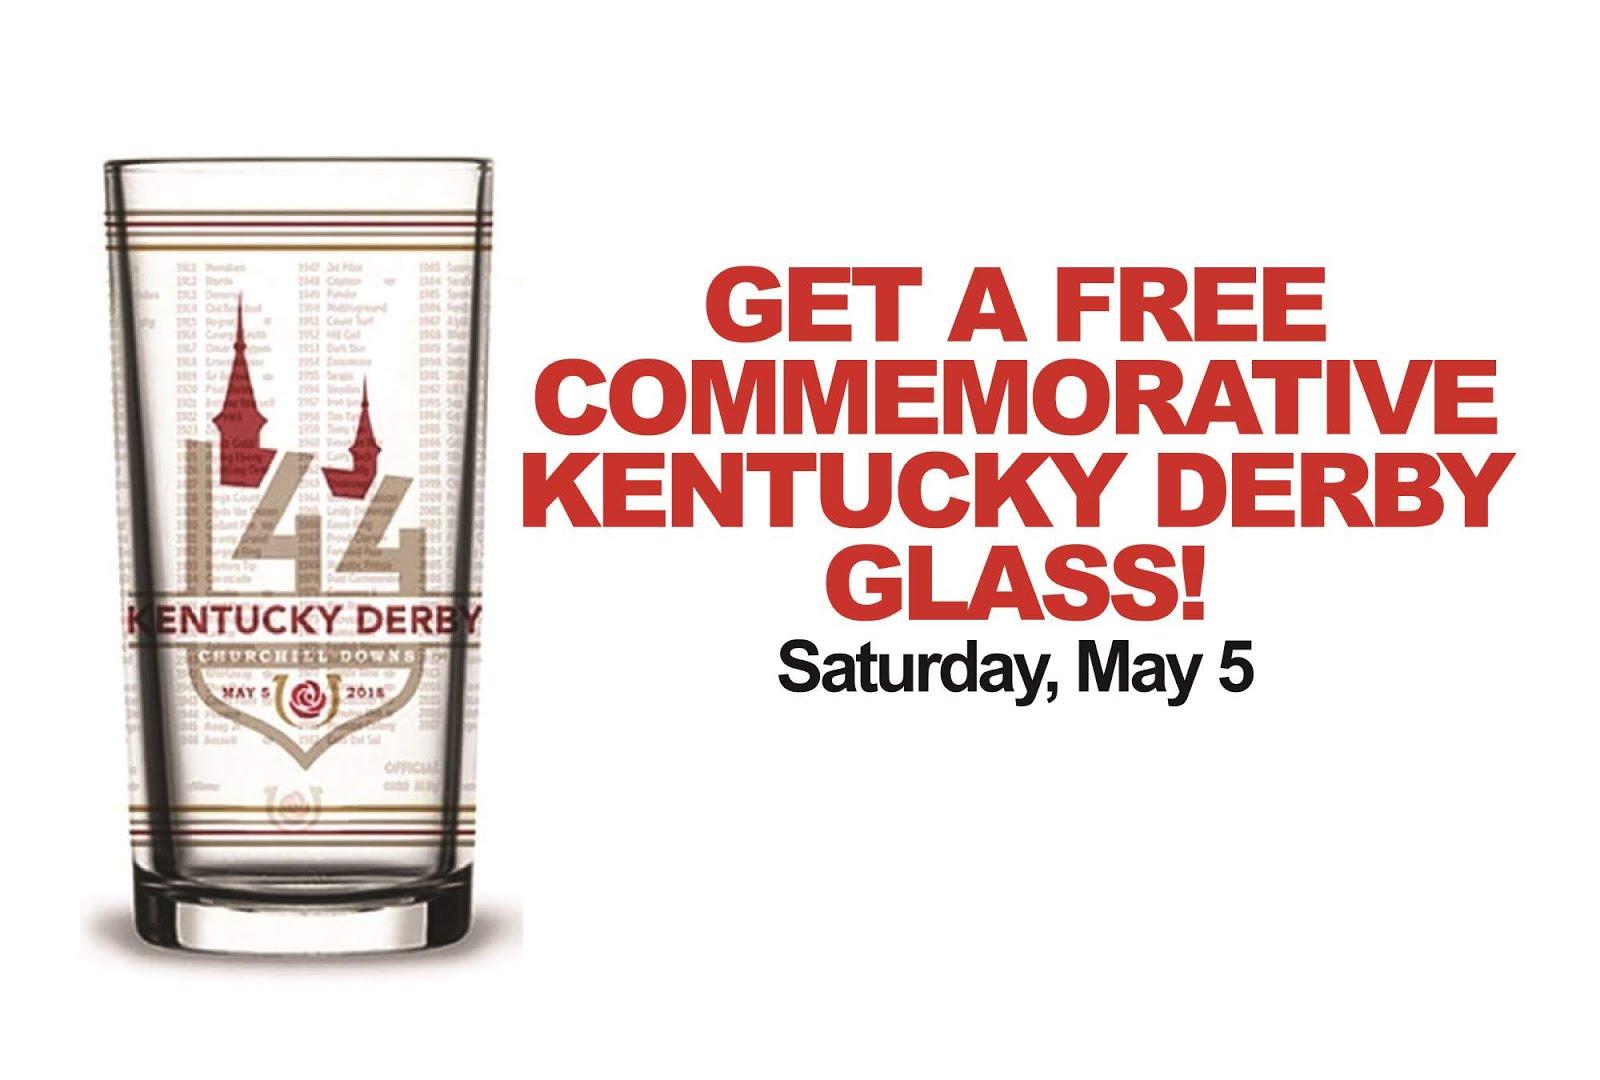 Free Kentucky Derby Glass